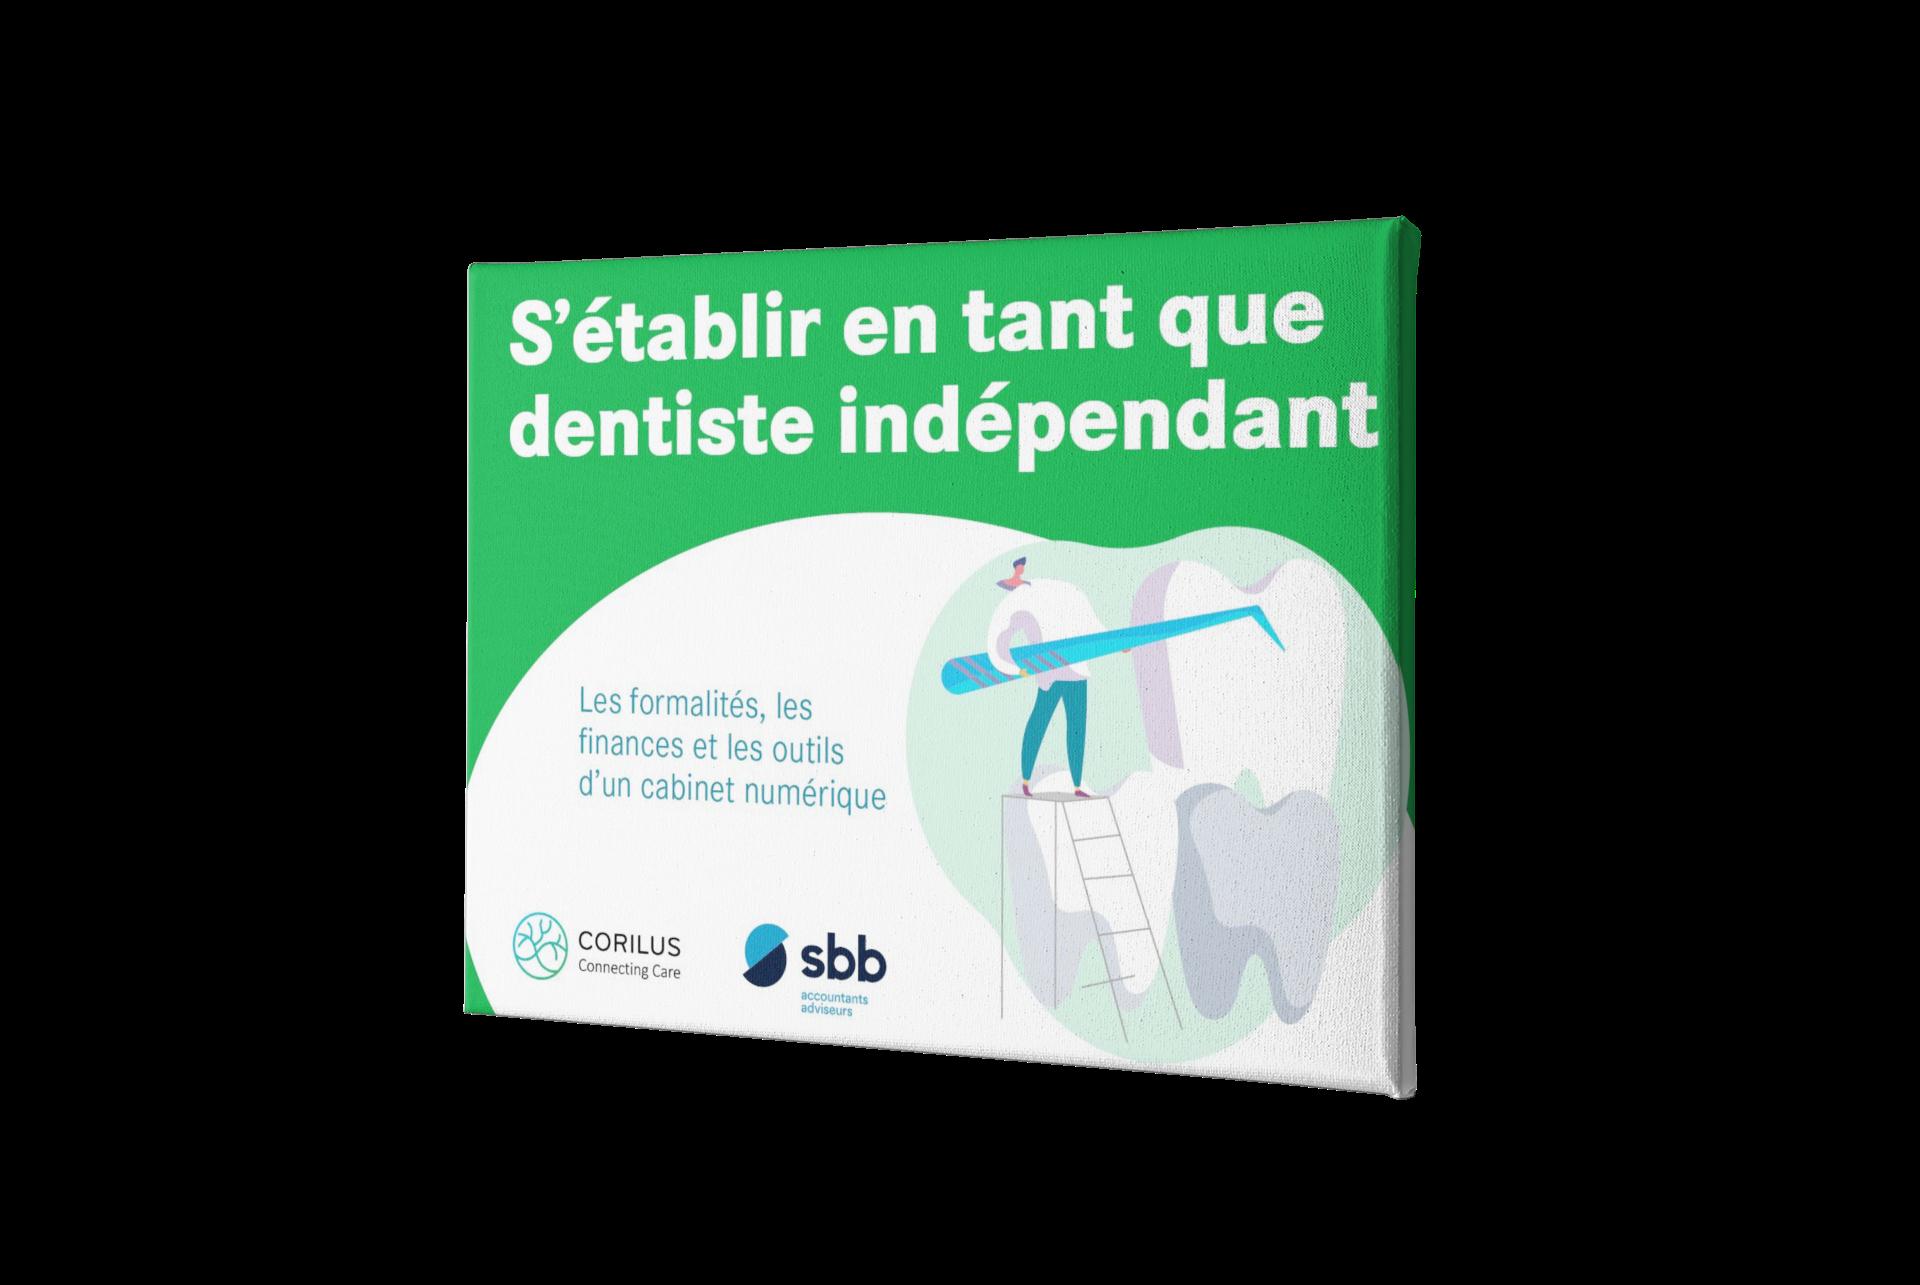 Dental-startersgids-omslag-FR